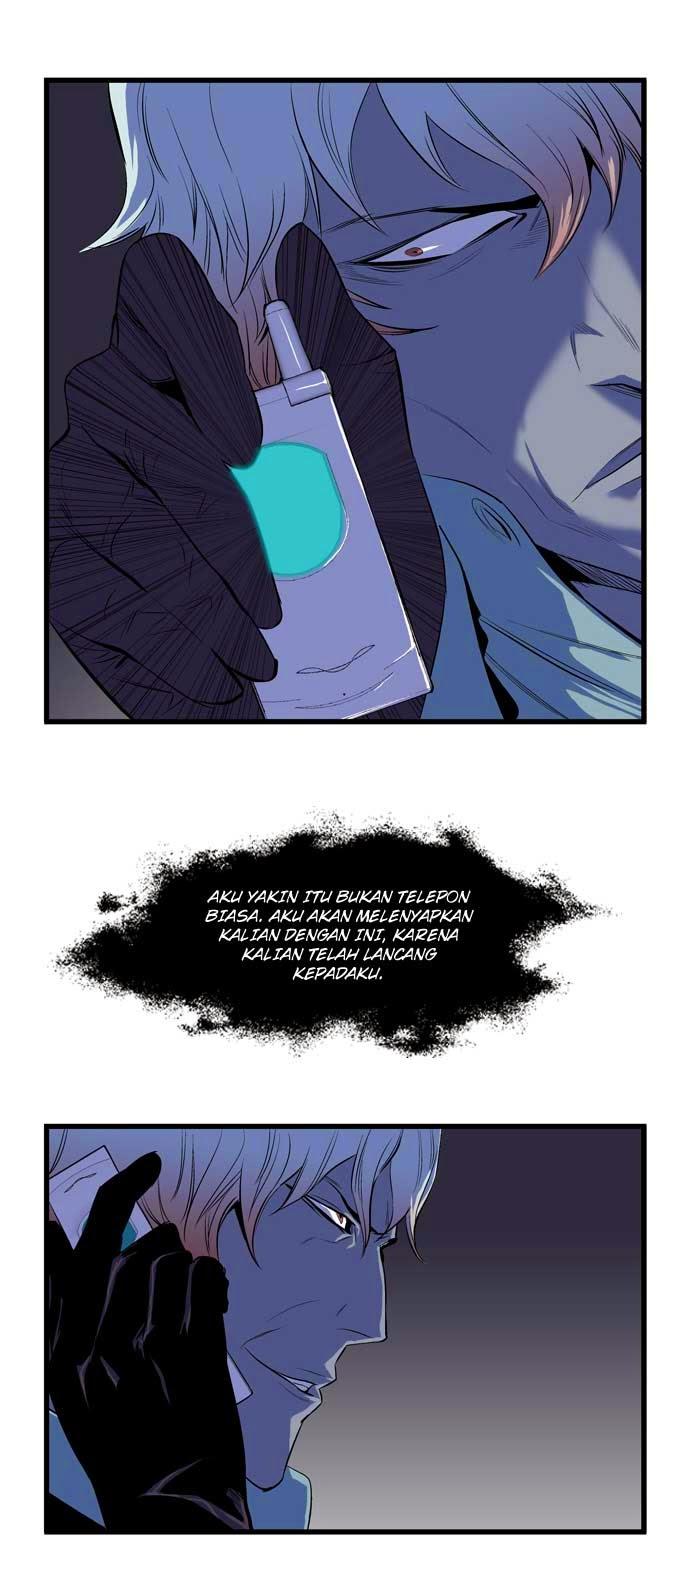 Komik noblesse 063 64 Indonesia noblesse 063 Terbaru 28|Baca Manga Komik Indonesia|